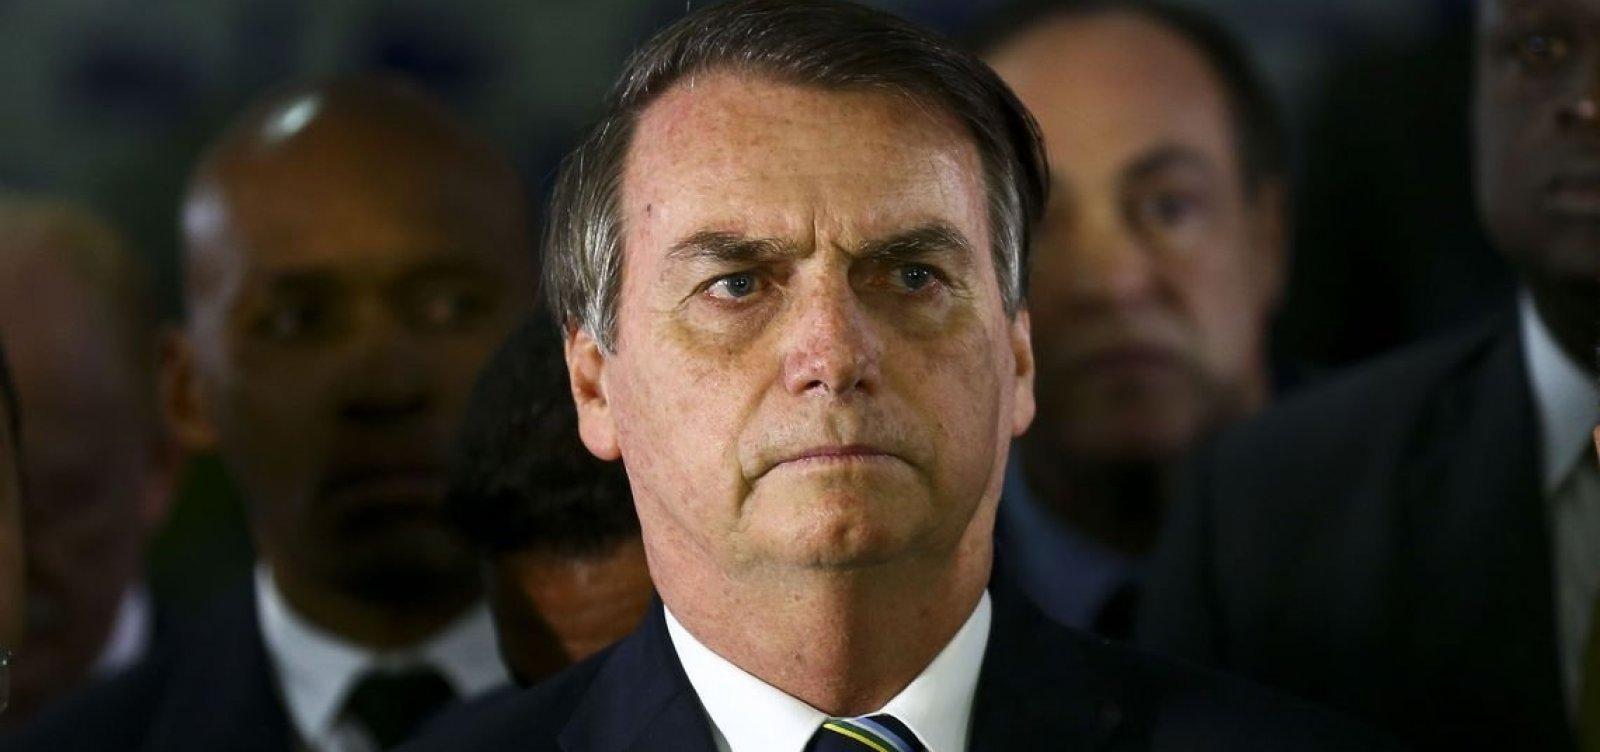 ['Acredito nele', diz Bolsonaro sobre Neymar]